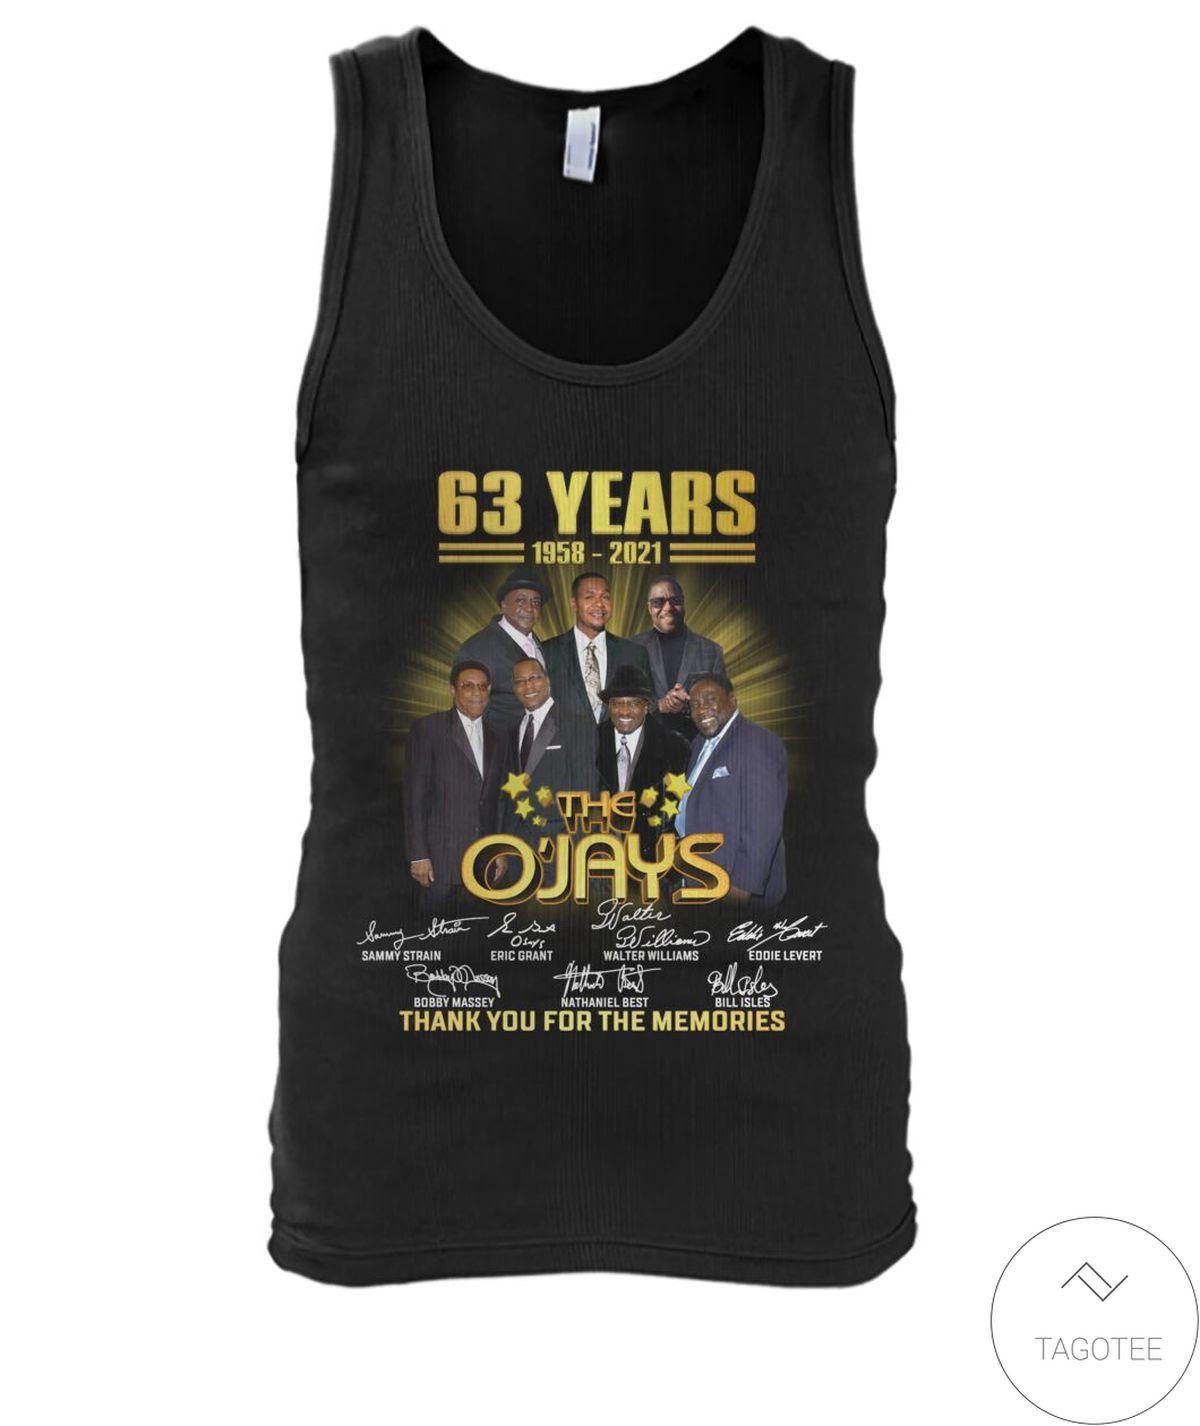 US Shop The O'jays 63 Years Anniversary 1958 2021 Shirt, hoodie, tank top